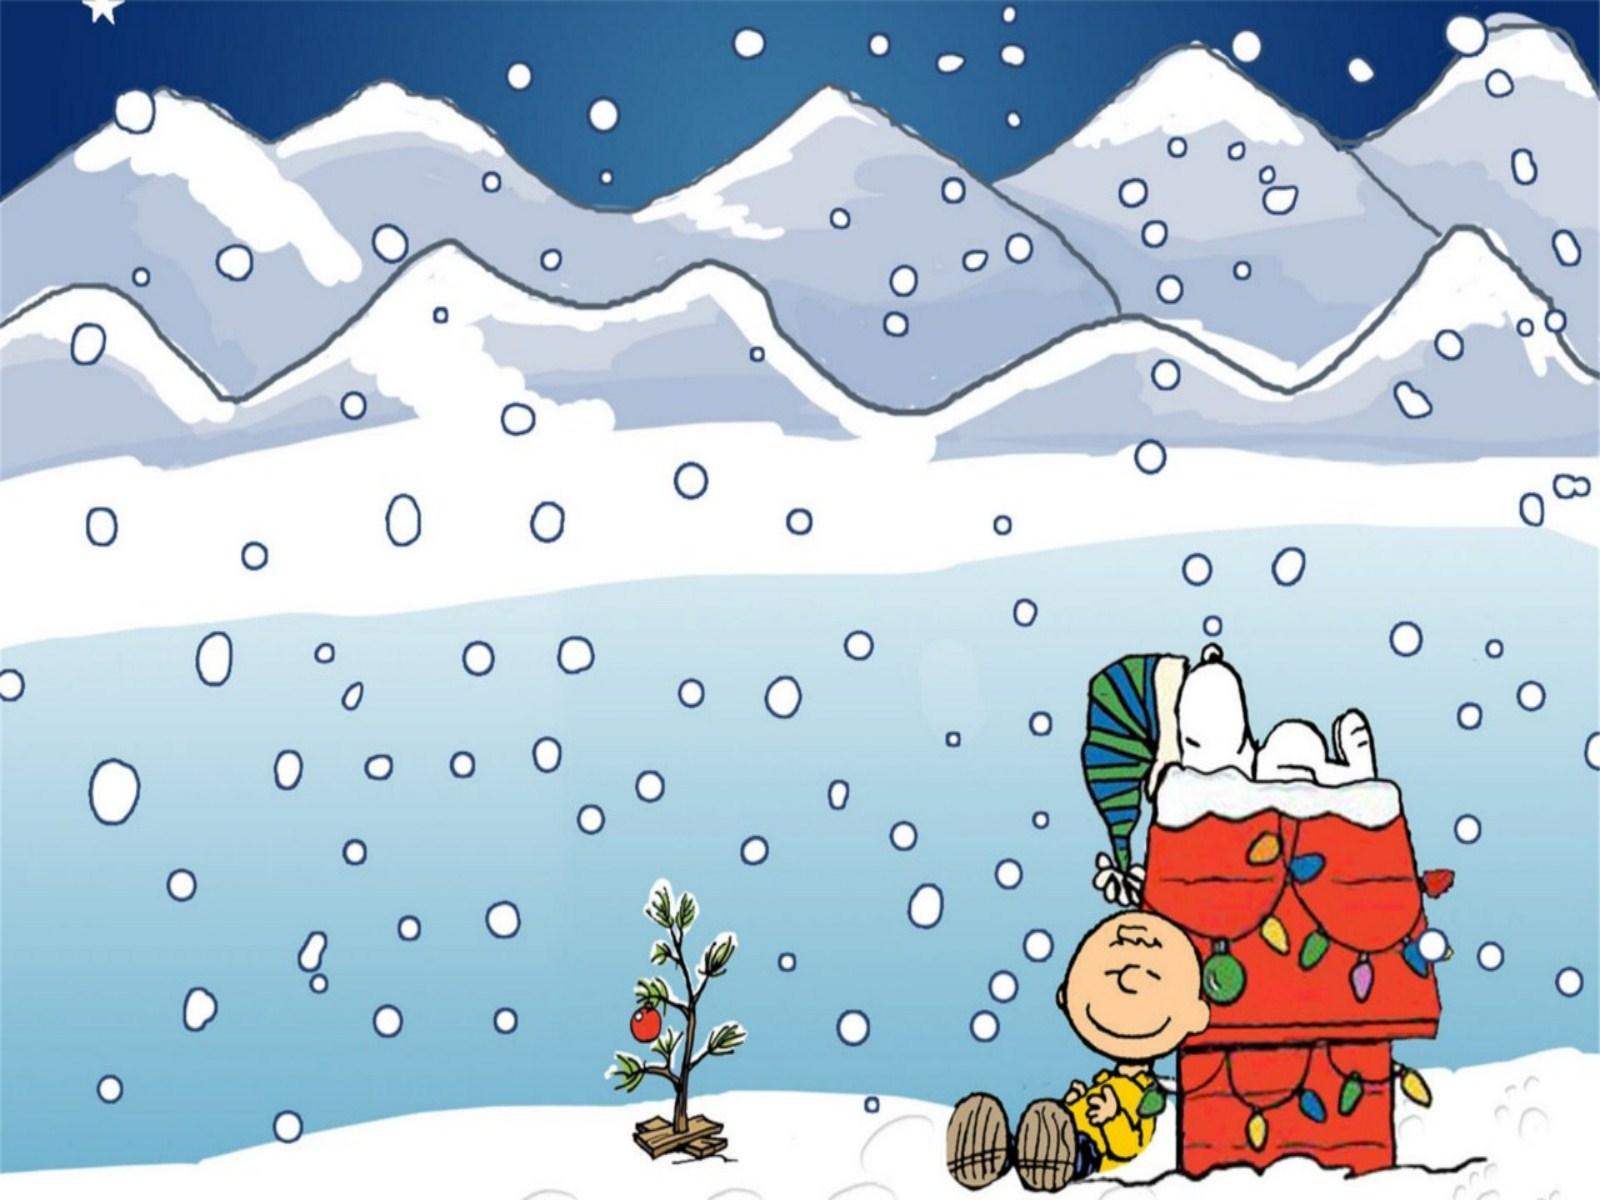 Wallpaper Mansion Charlie Brown Christmas Wallpaper